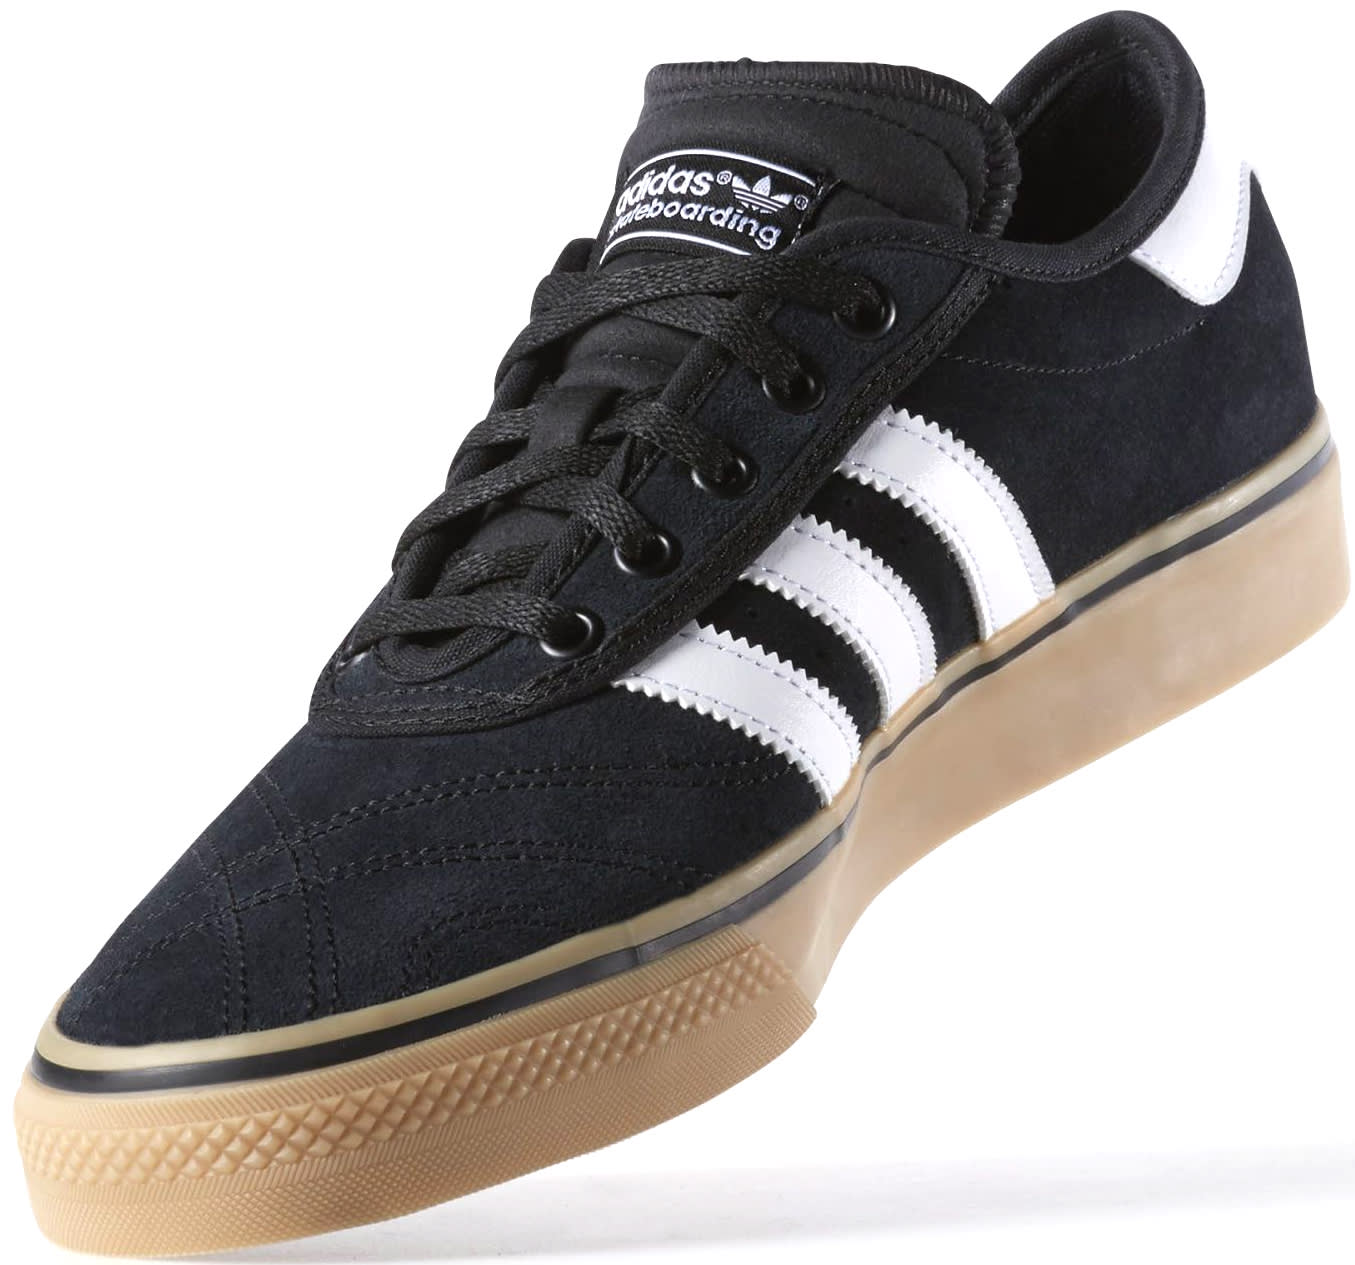 sports shoes 4529f 9d36c Adidas Adi-Ease Premiere ADV Skate Shoes - thumbnail 4